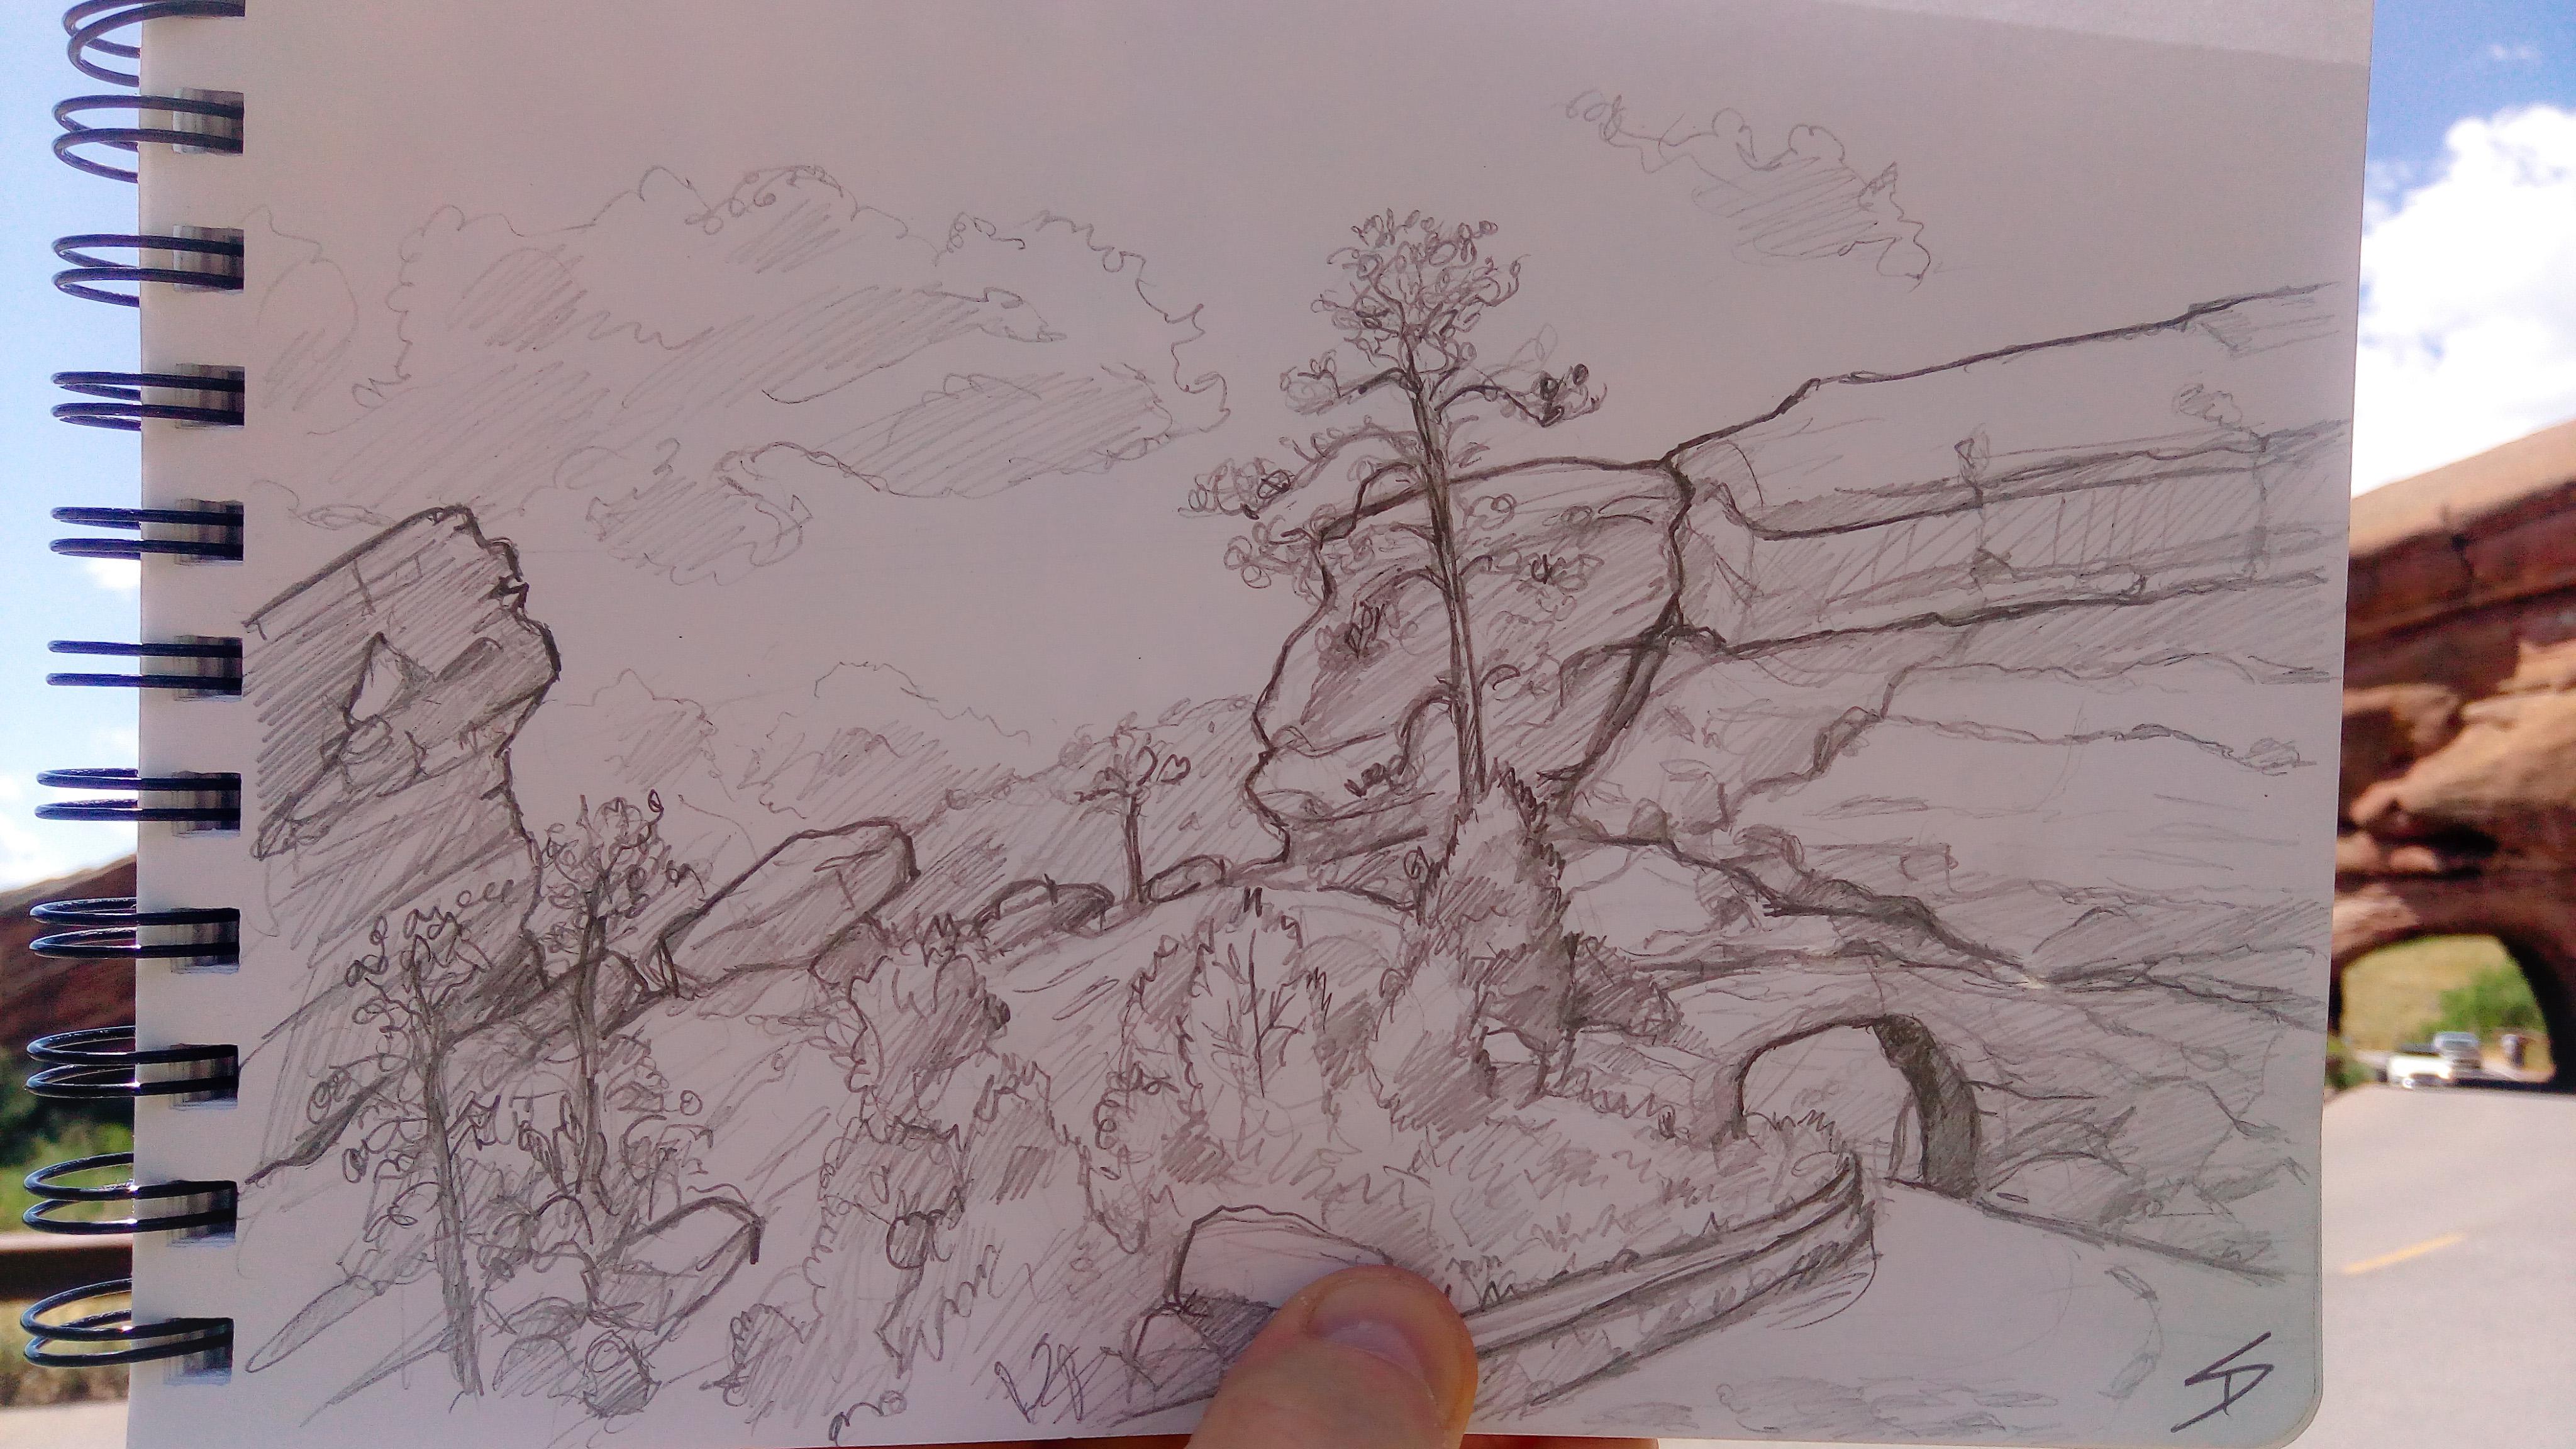 Urban photo art – Morrison, Colorado, US. 'Red Rocks Park.' Artwork from my latest travel art blog article 'Wild Colorado.' Now online - sketchbookexplorer.com @davidasutton @sketchbookexplorer Facebook.com/davidanthonysutton #sketch #drawing #art #us #redrockscolorado #colorado #redrocksamphitheater #wild #travel #travelblog #unitedstates #northamerica #nature